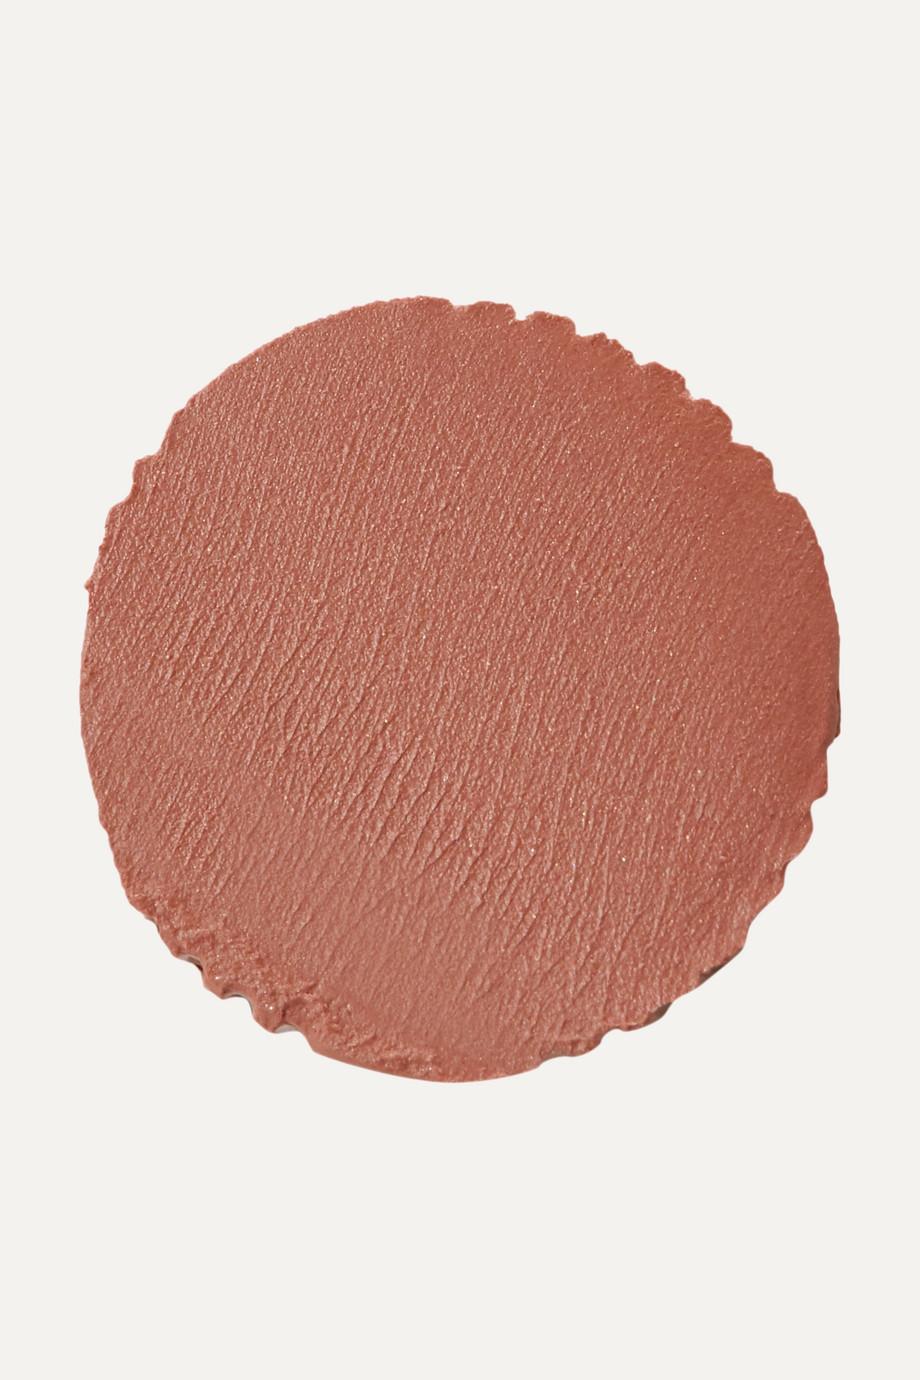 Burberry Beauty Lip Velvet - Nude No.407